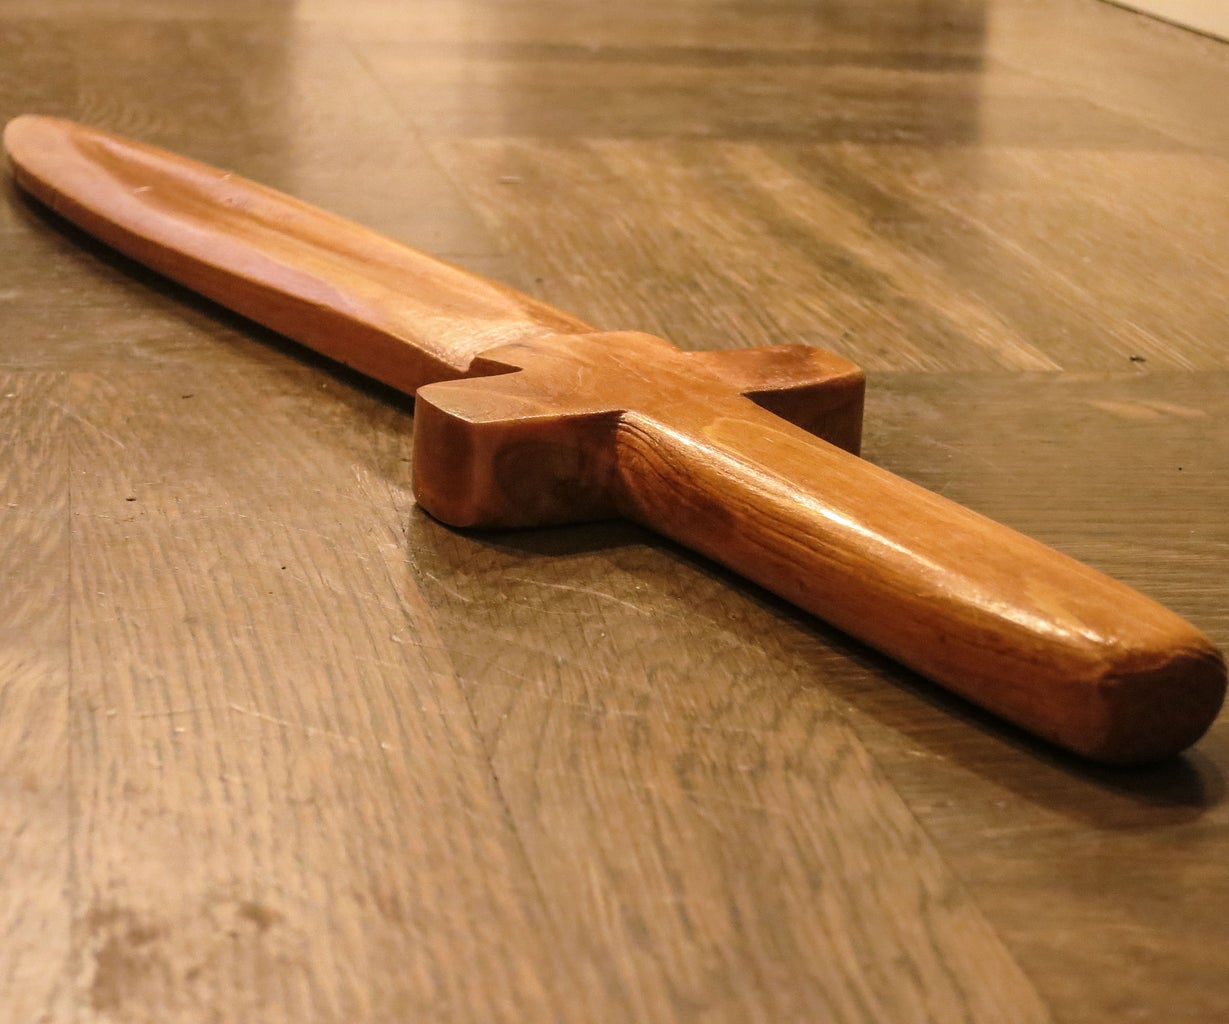 (Optionally), Stain / Finish the Wood